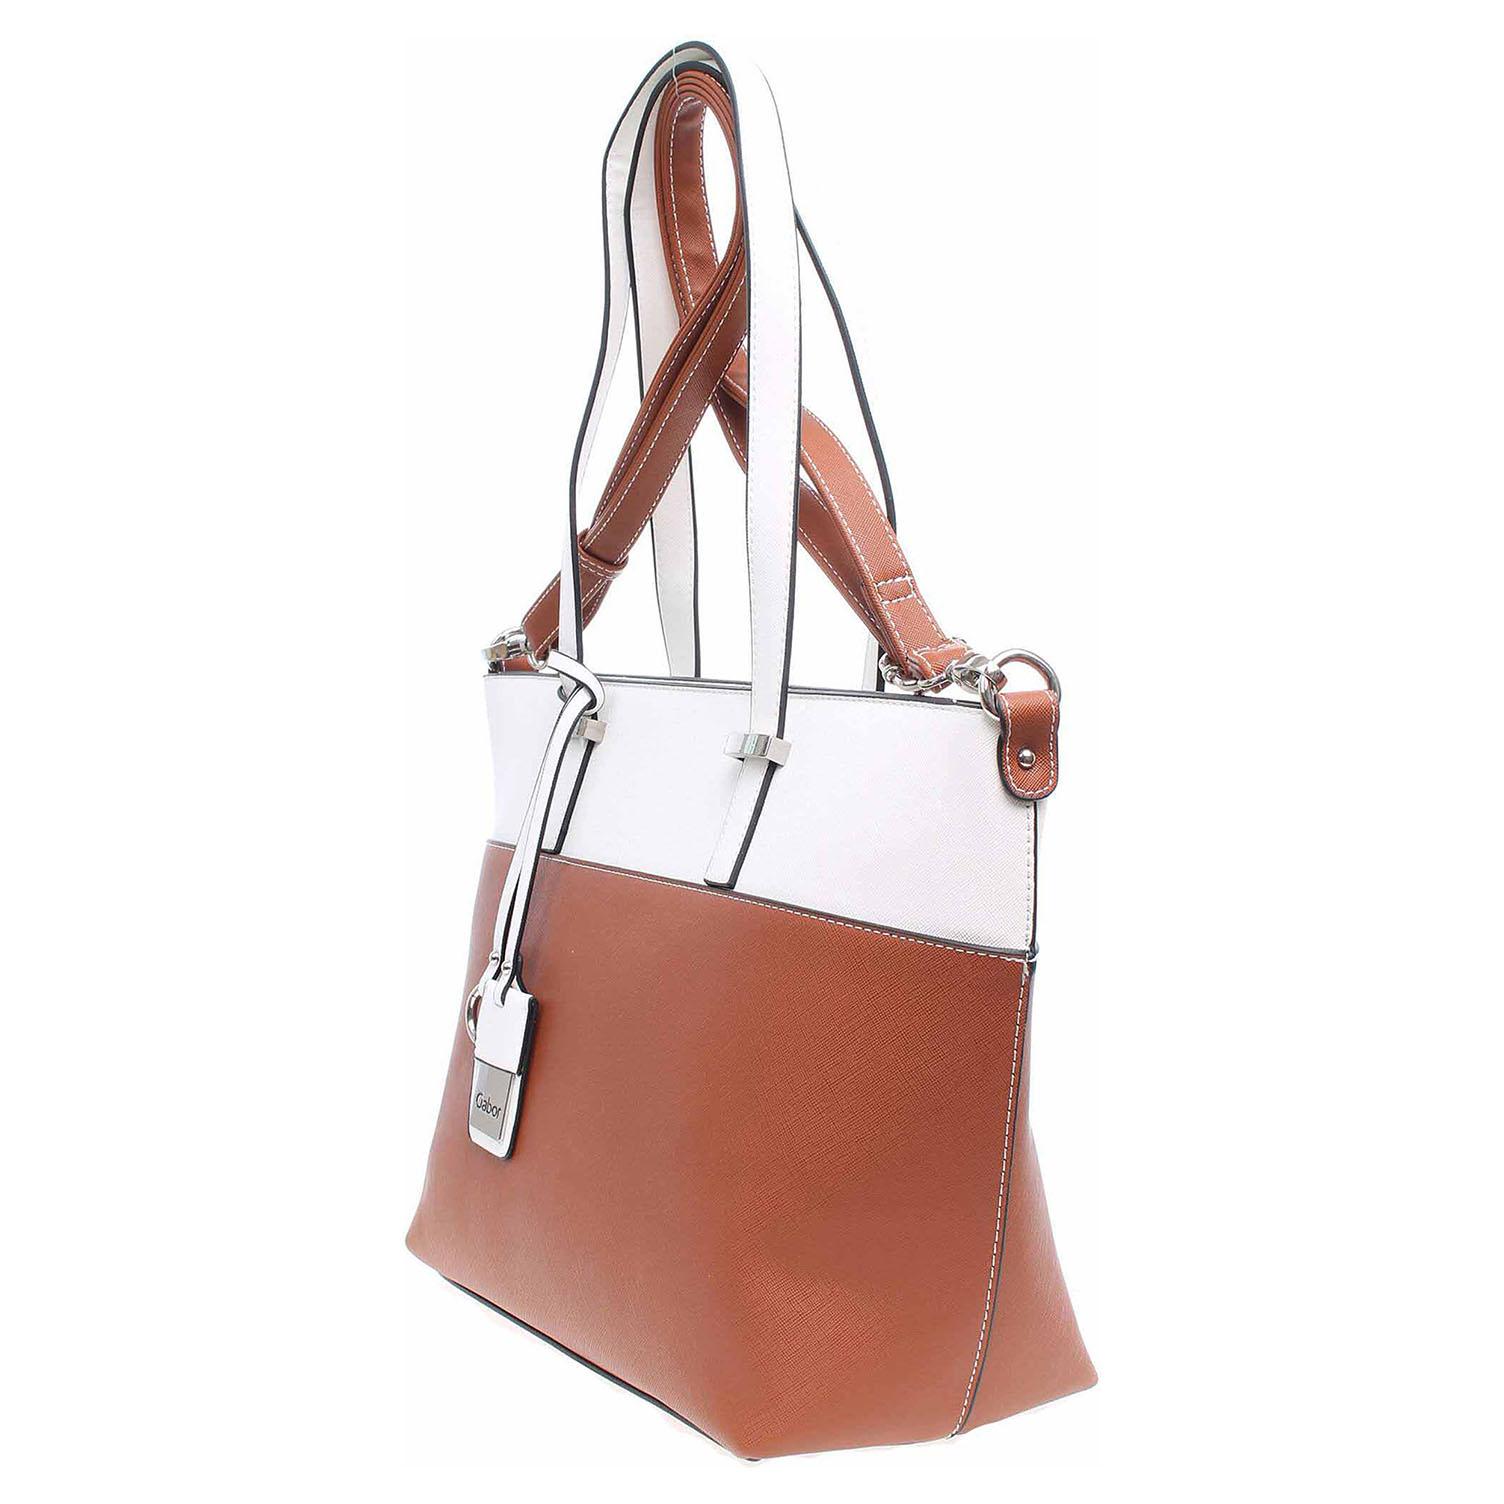 Ecco Gabor dámská kabelka 7635 22 Tivoli hnědá 11891172